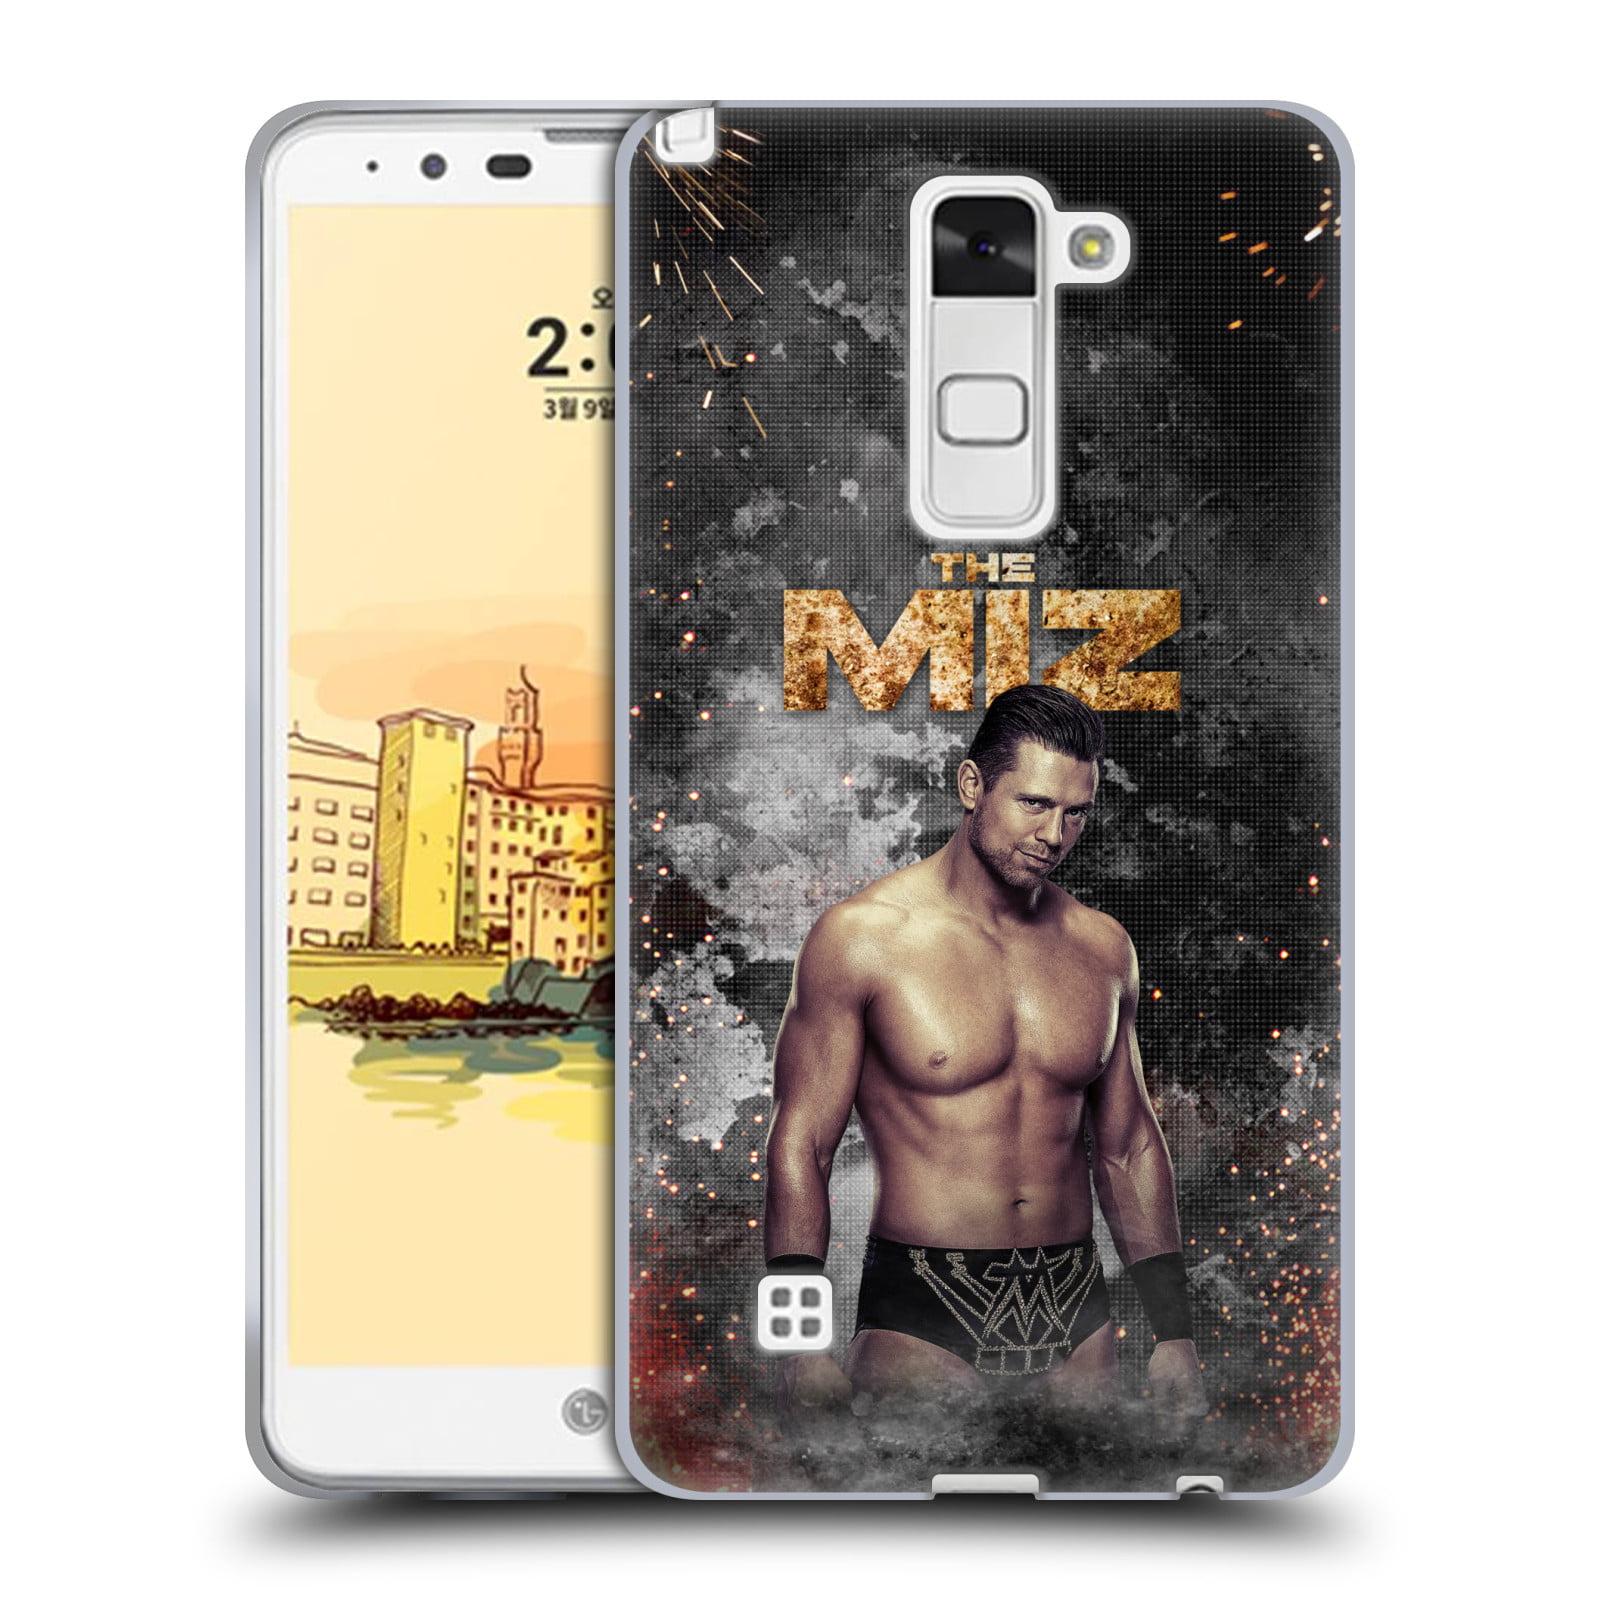 OFFICIAL WWE THE MIZ SOFT GEL CASE FOR LG PHONES 3